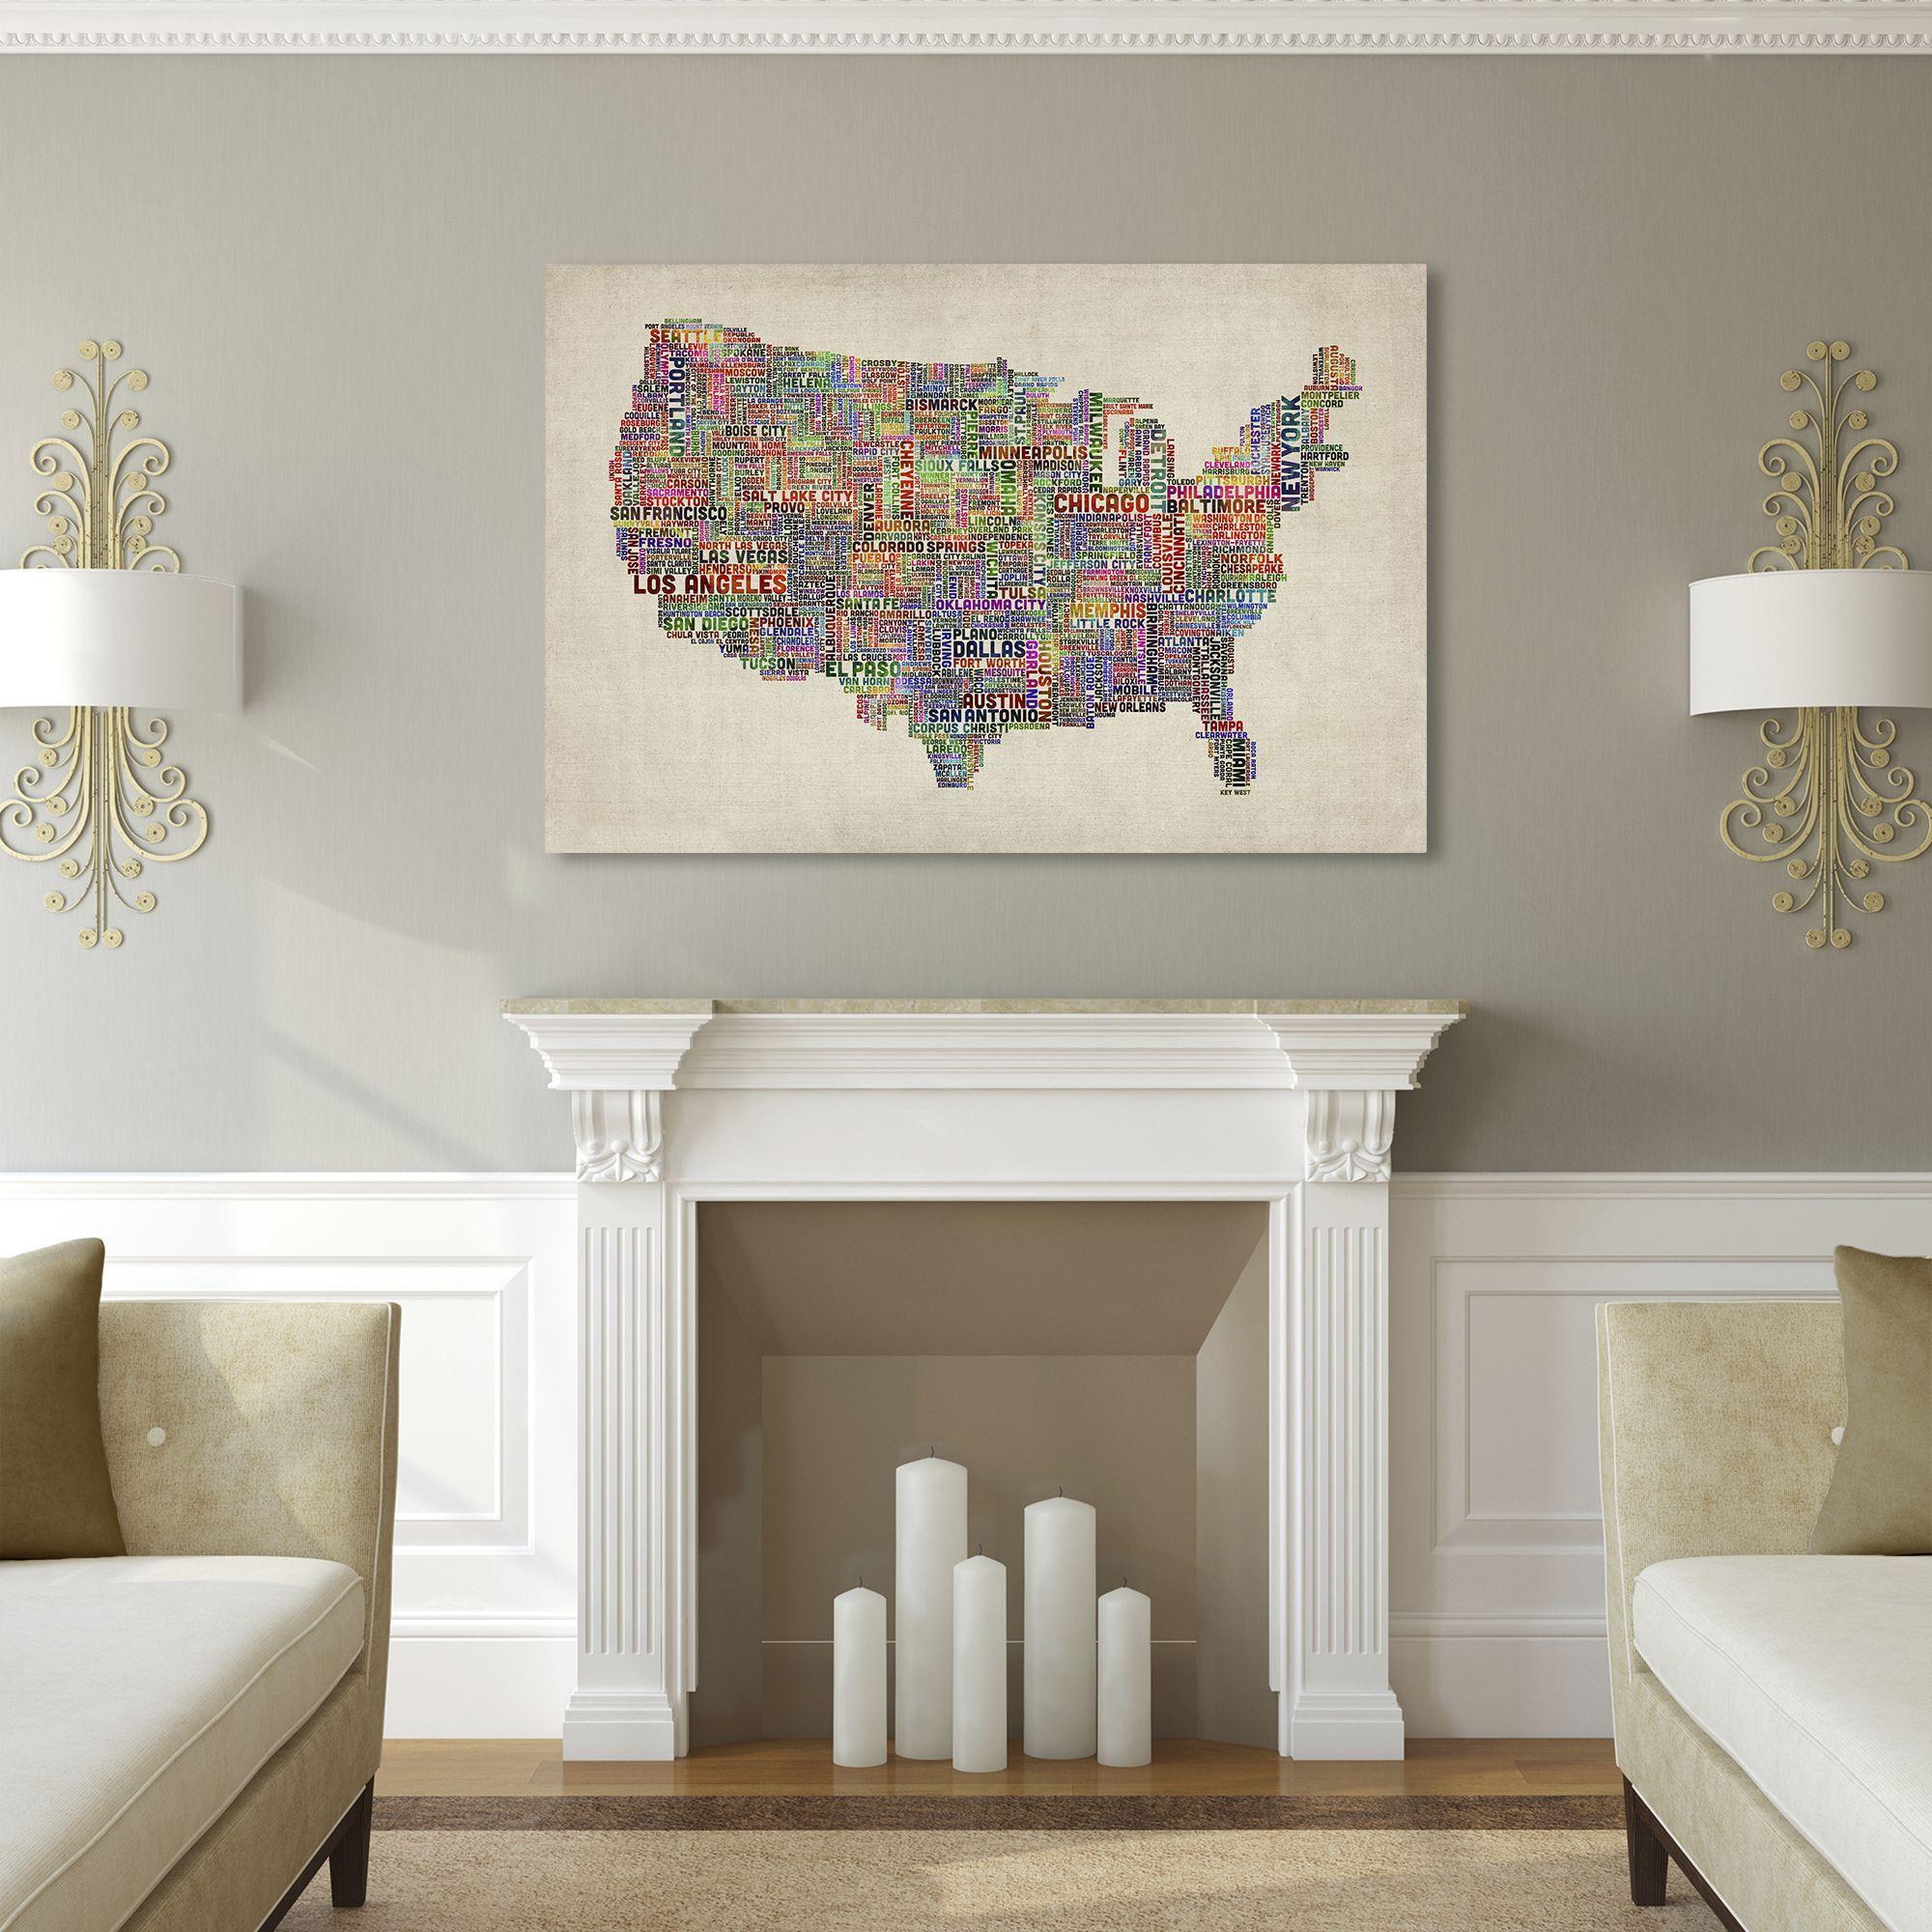 Michael tompsett us cities text map vi canvas art multi 30 in michael tompsett us cities text map vi canvas art multi 30 in gumiabroncs Gallery